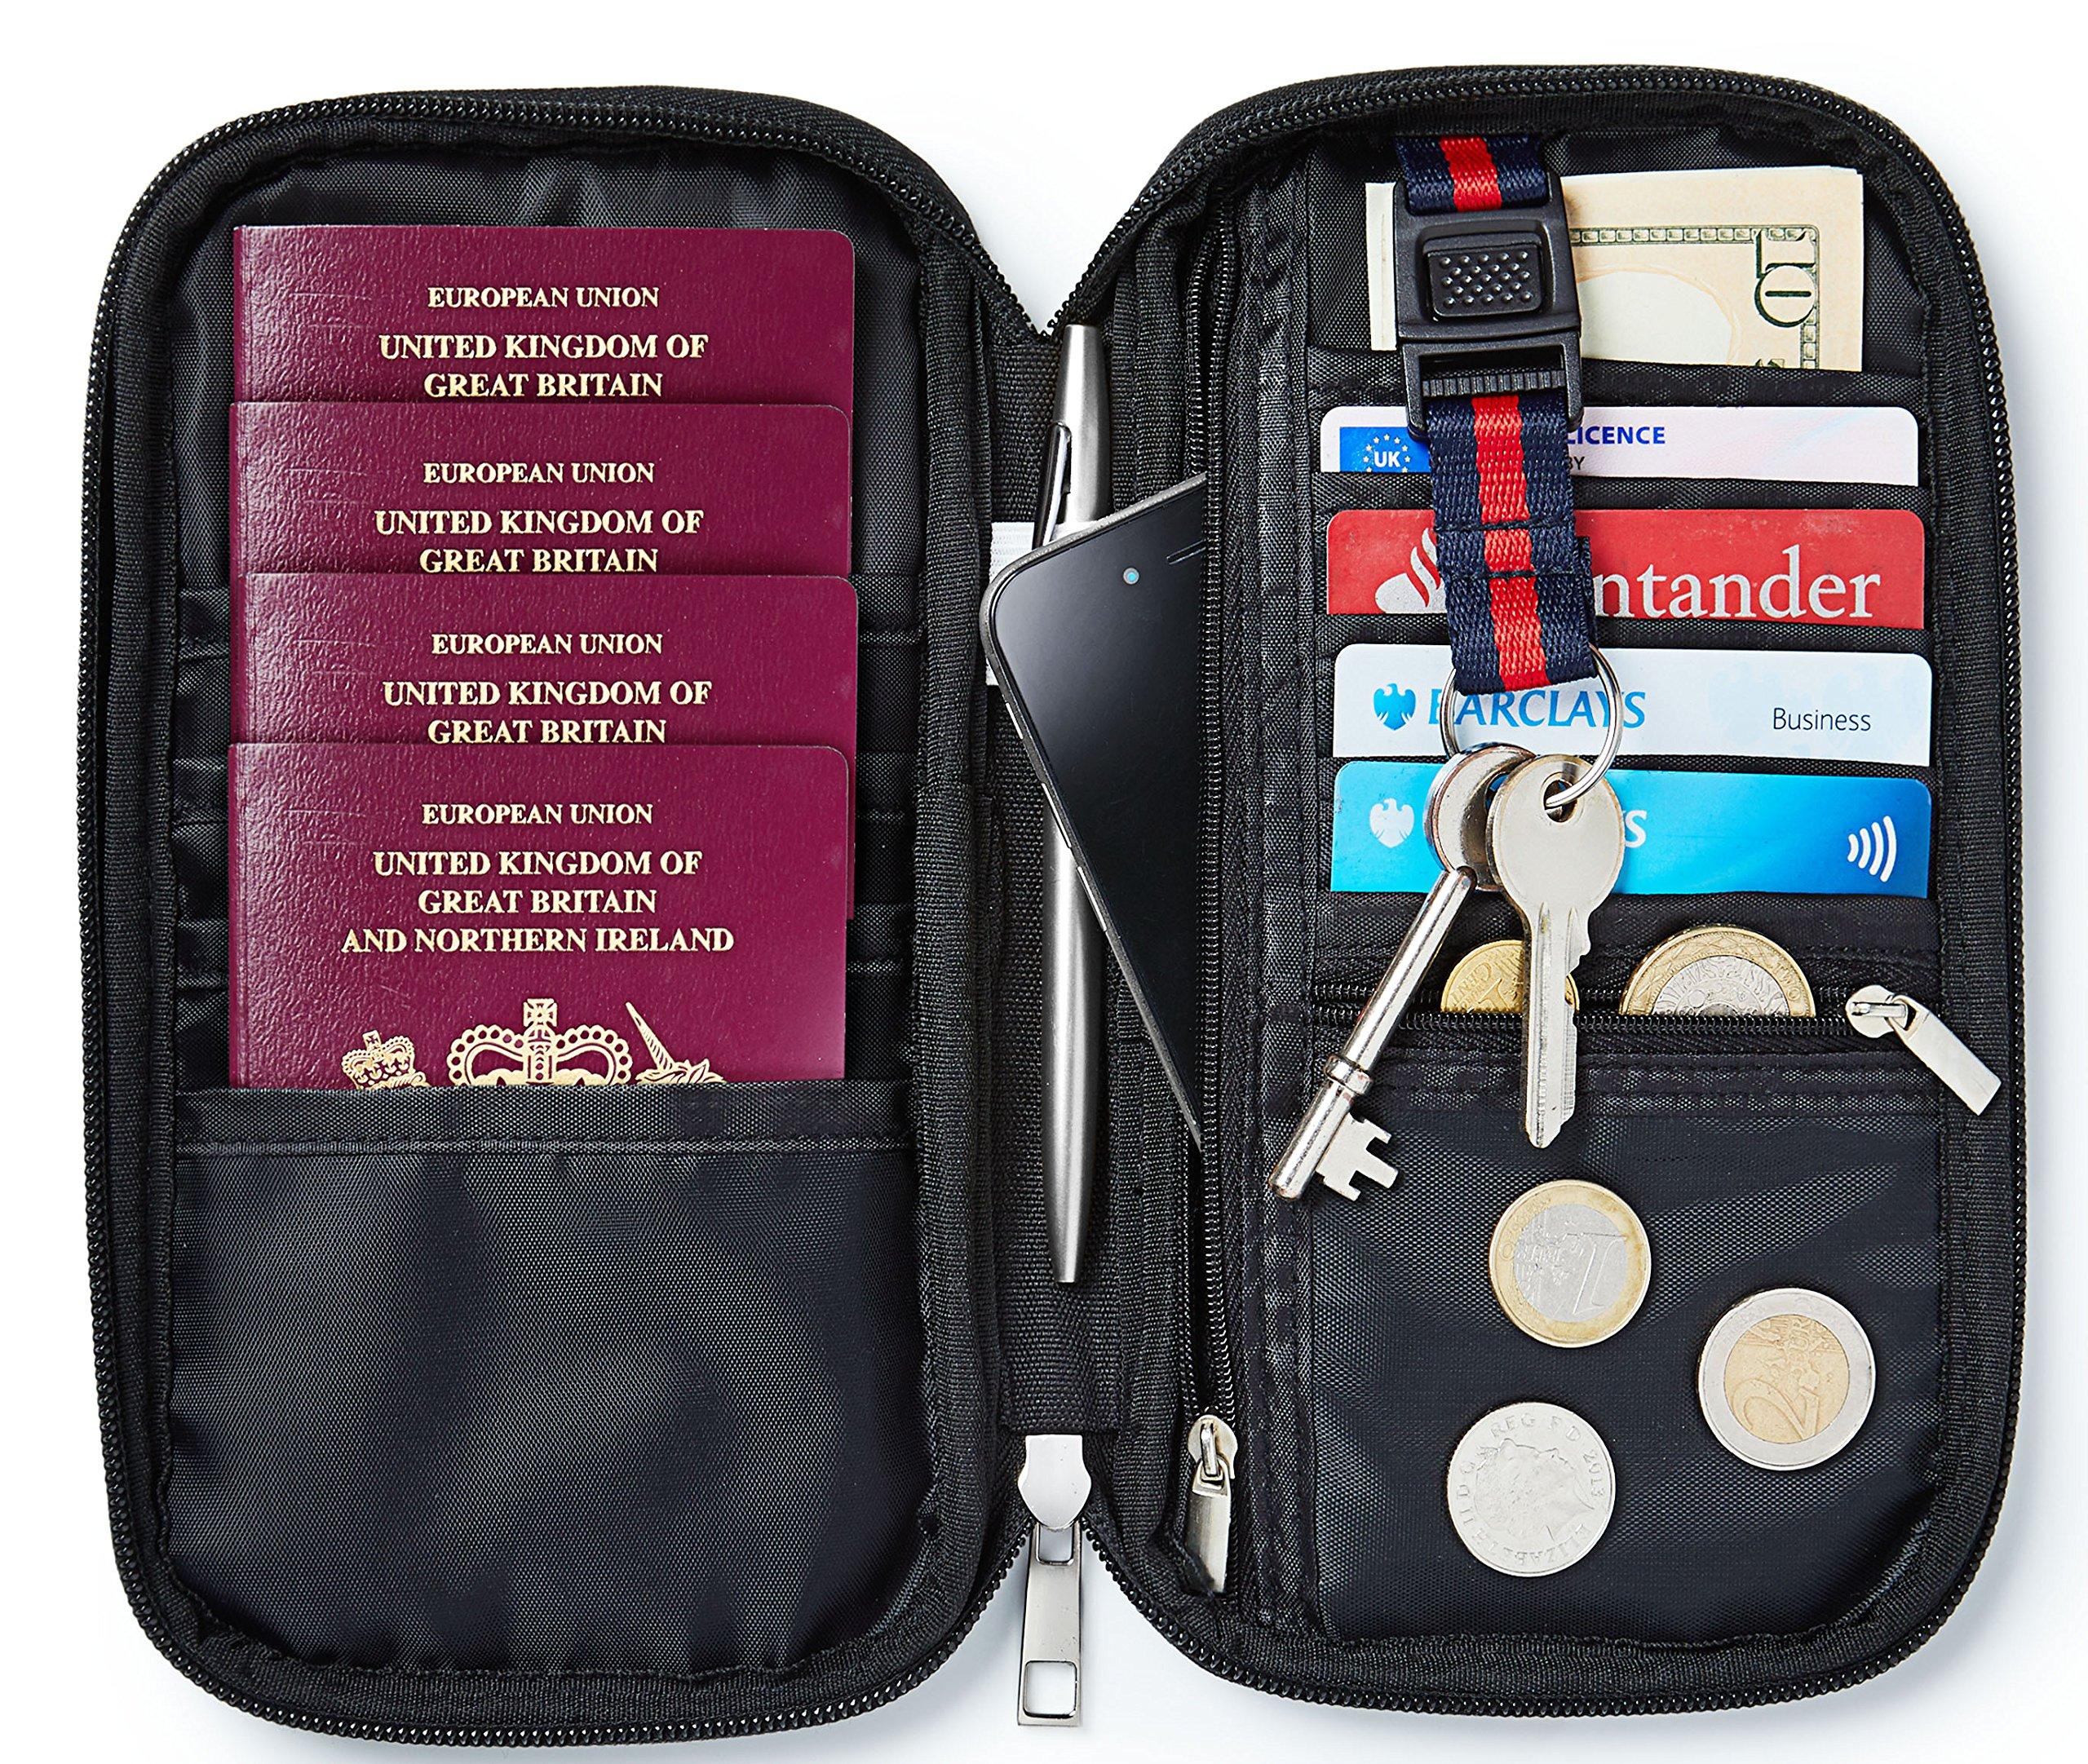 Quality Multi Purpose Travel Document Boarding Pass Organiser Passport Wallet Ticket Credit Card Holder W/Detachable Key Holder (Black)